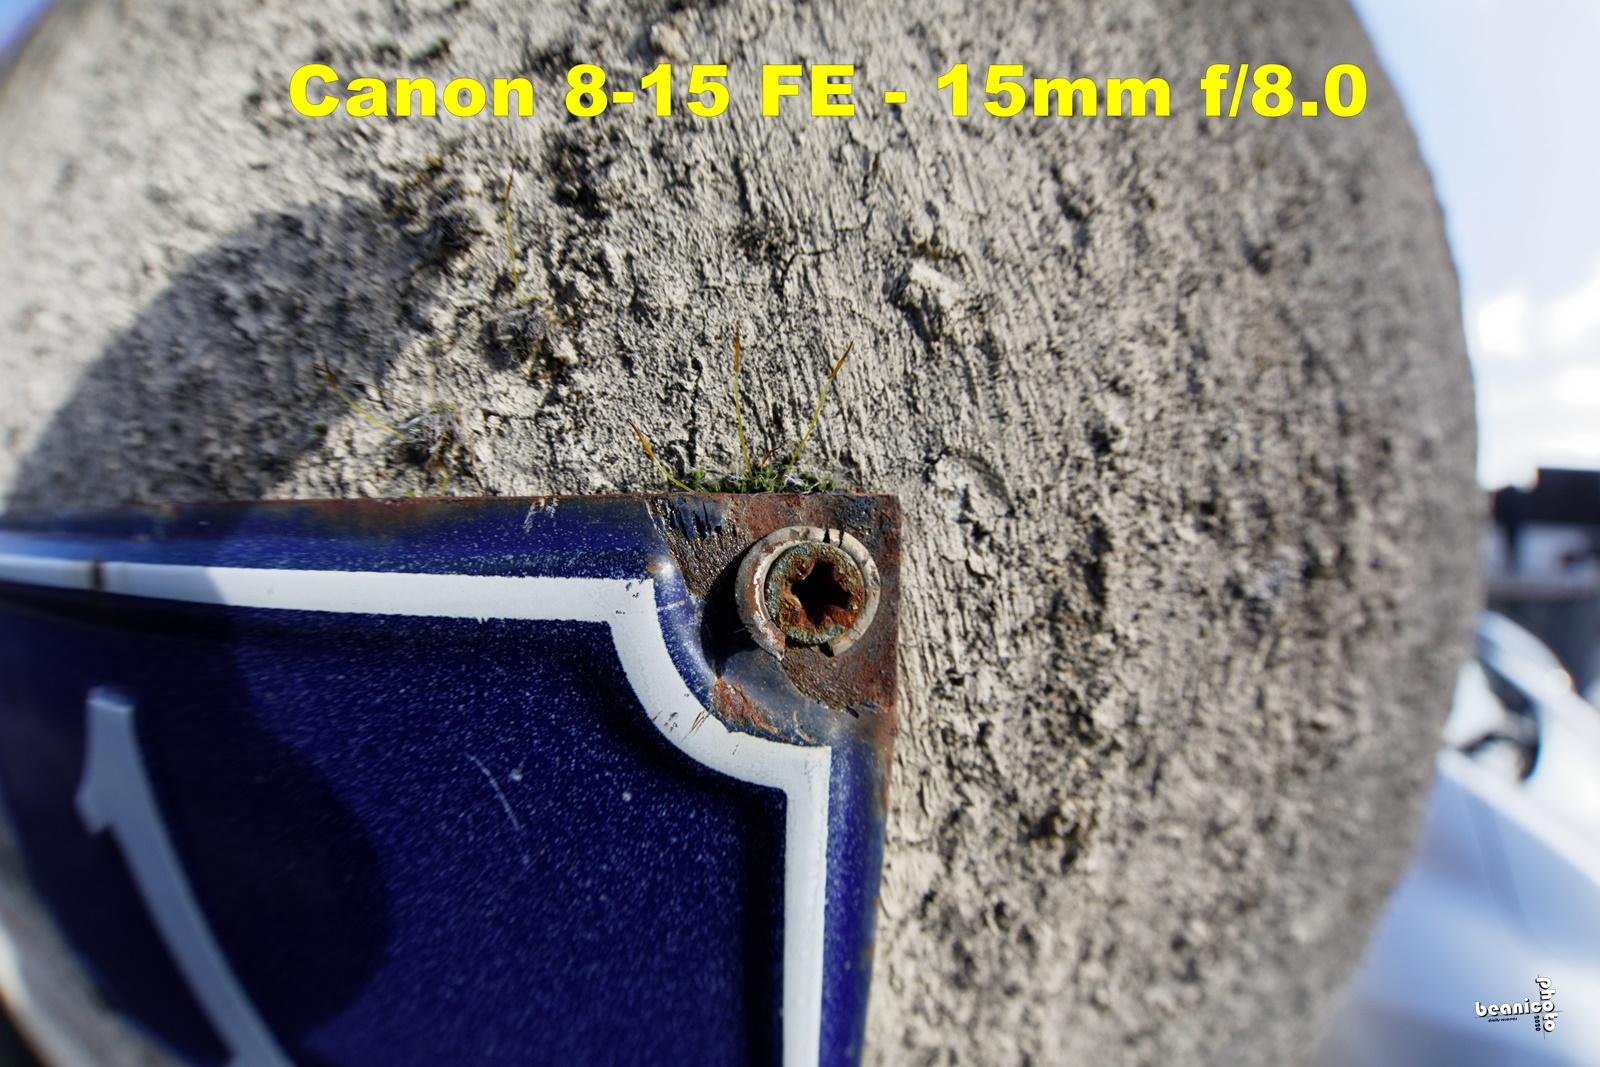 www.beanico-photo.fr - test du Canon 8-15mm f/4 L